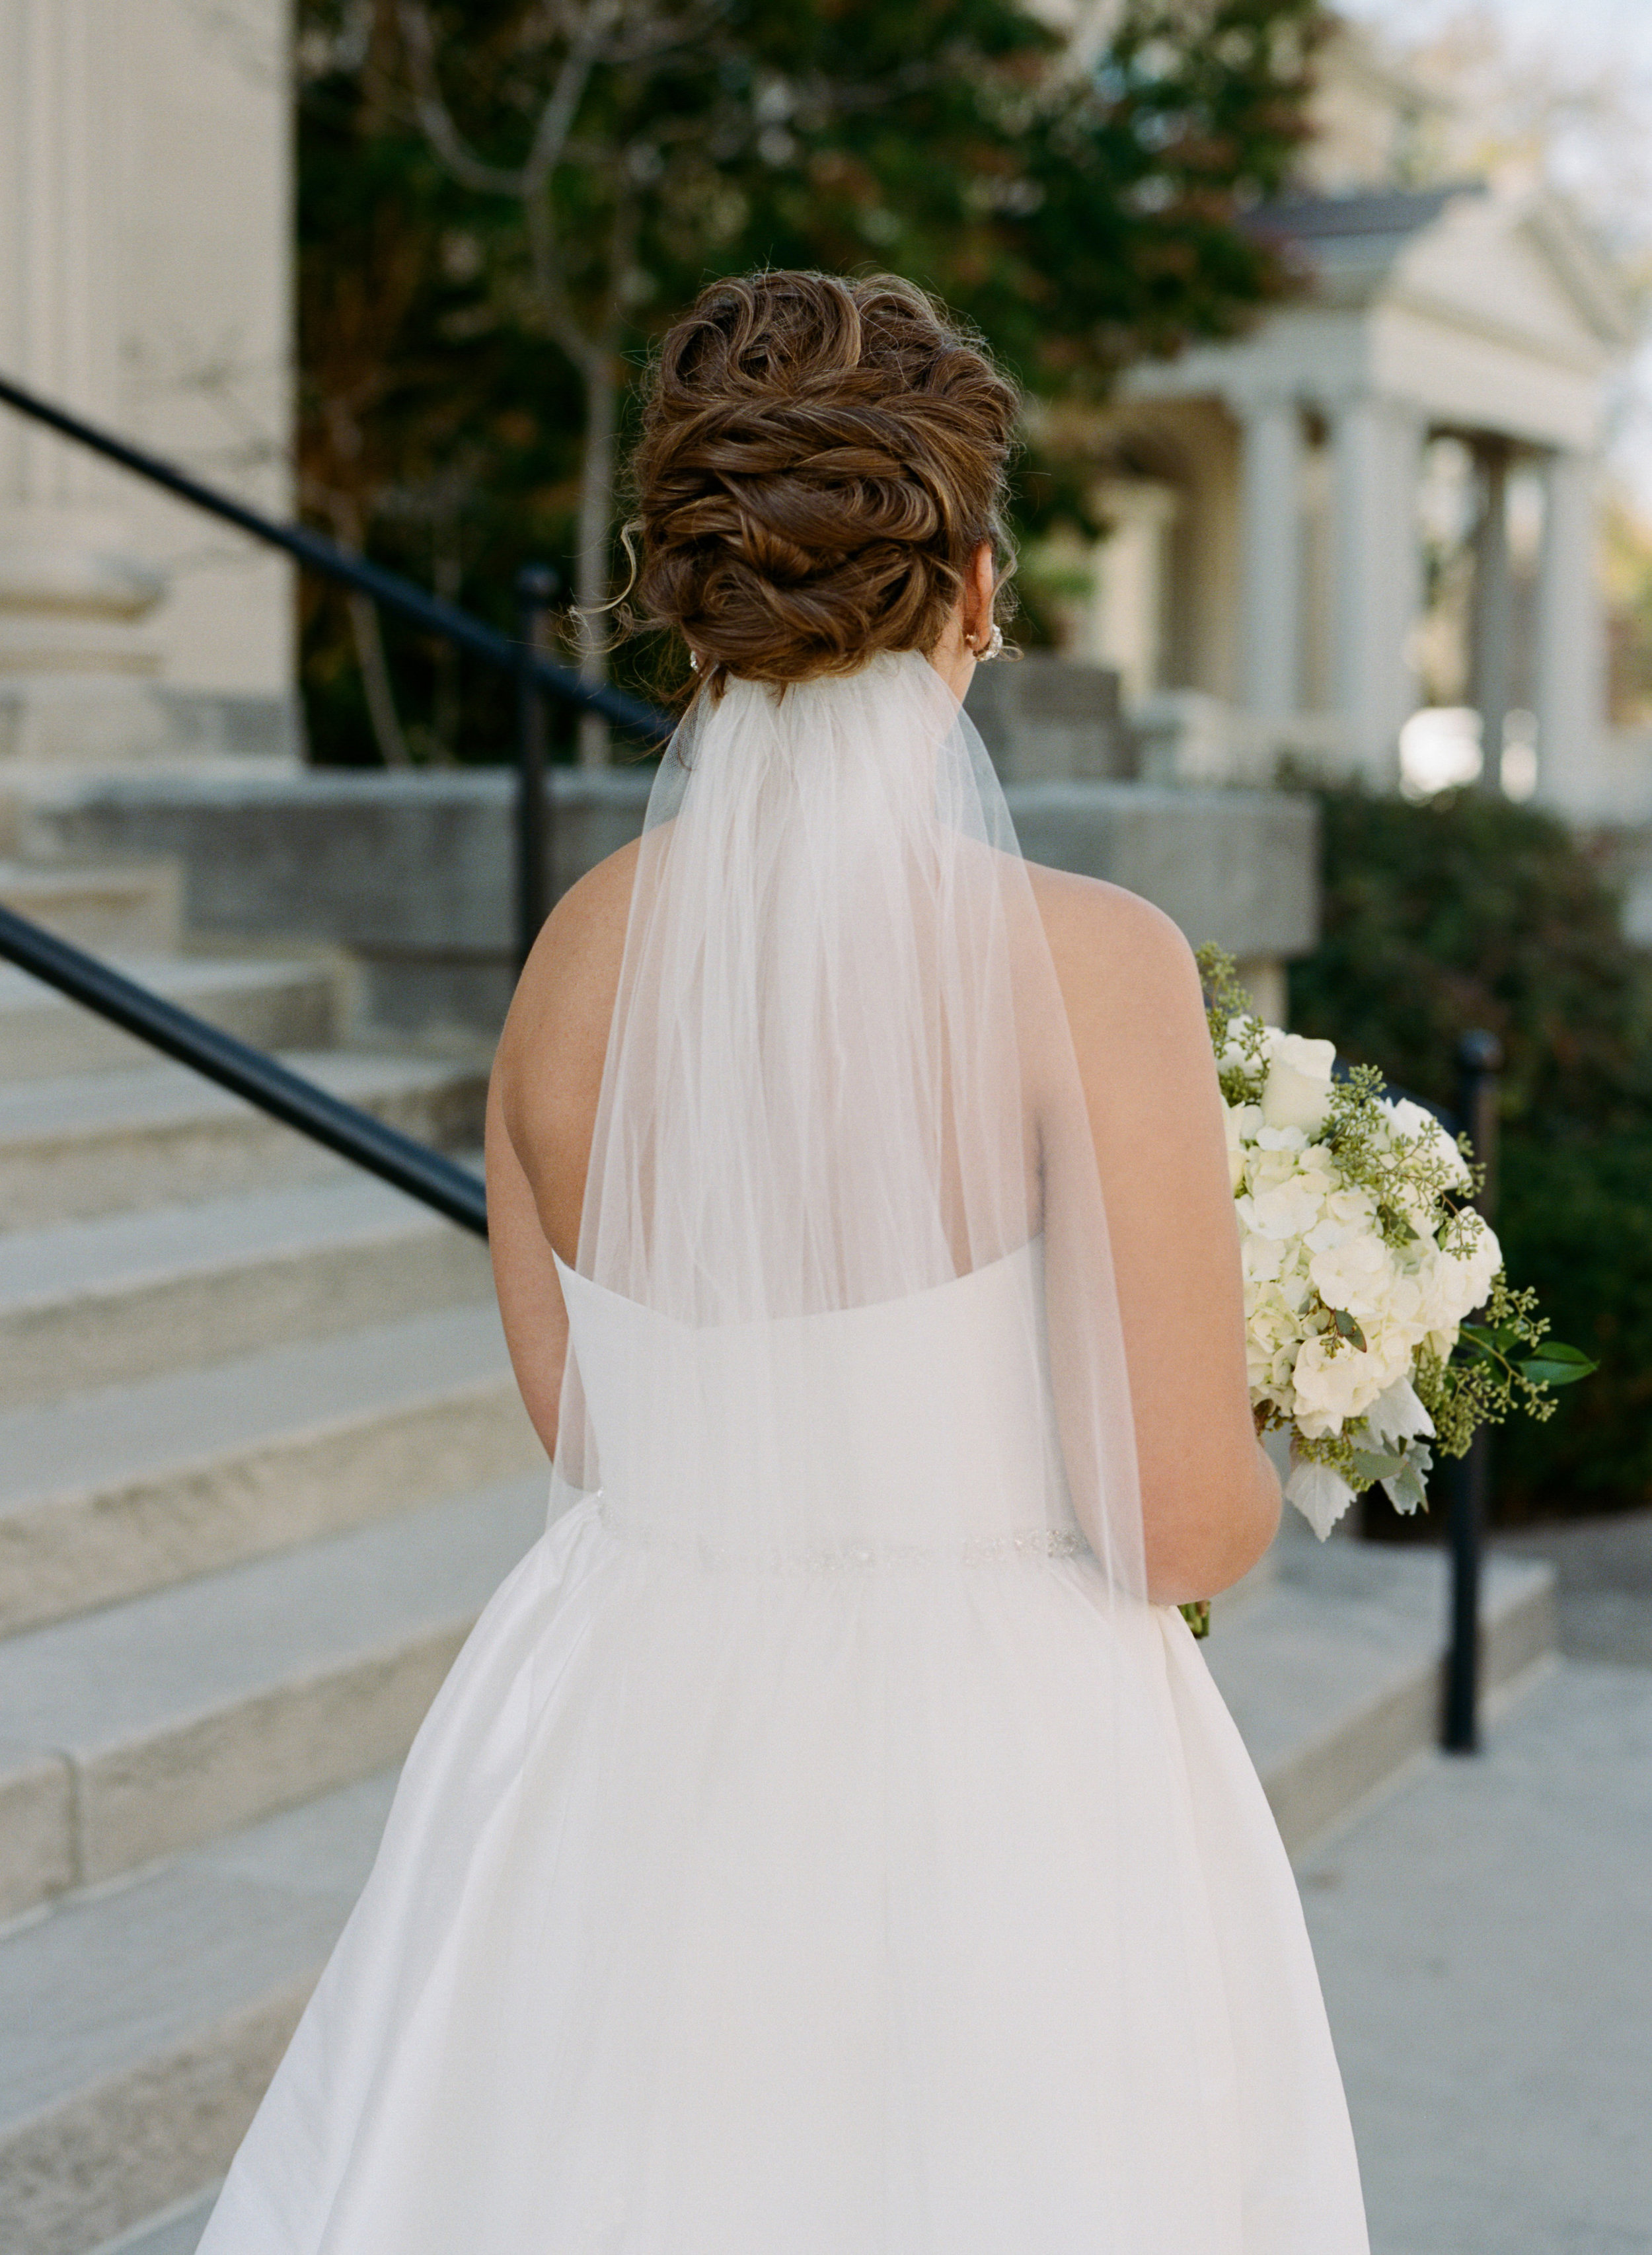 02_Bride-9.jpg